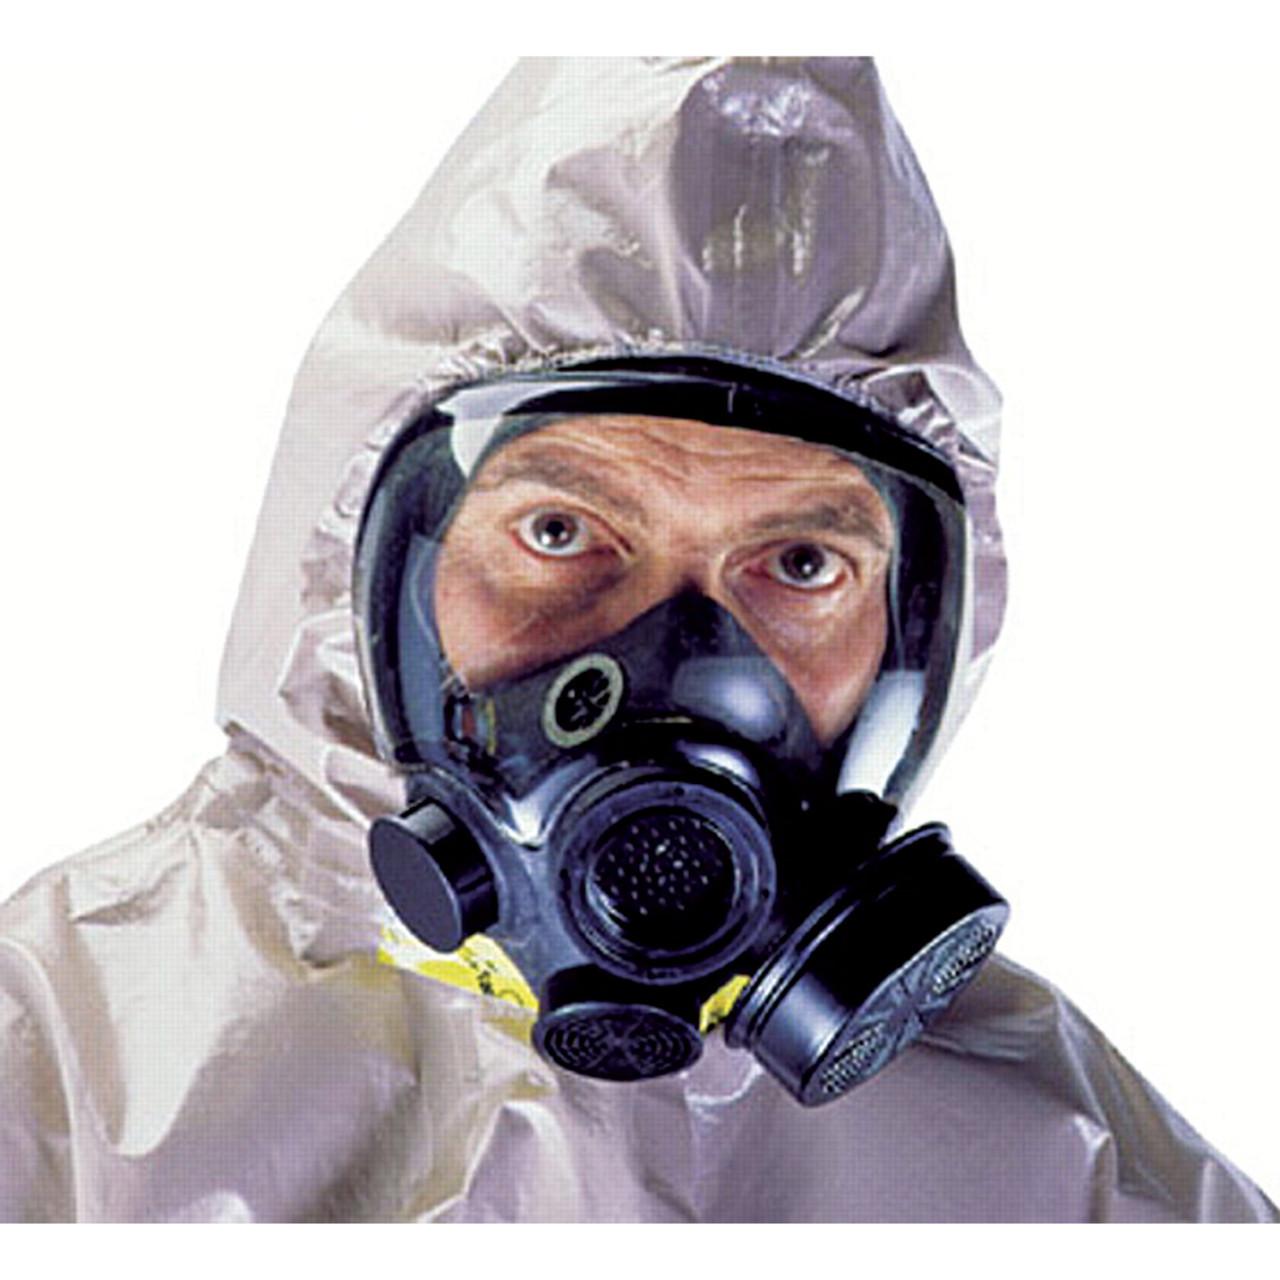 Riot Hycar Mask Advantage Control Msa Gas 1000